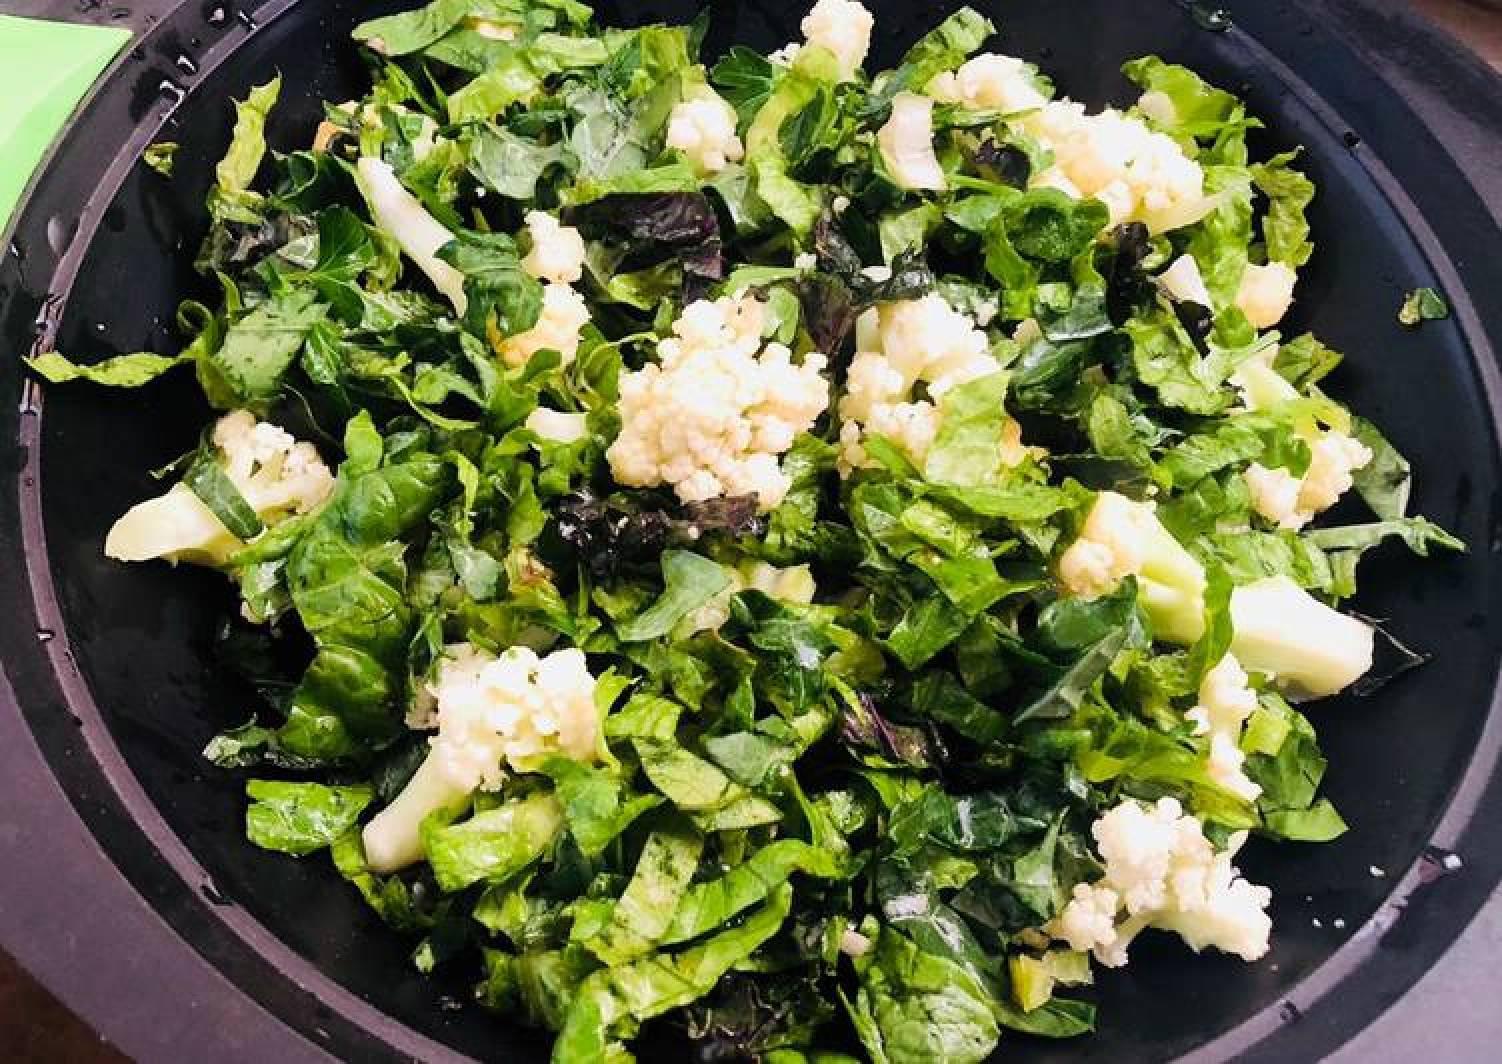 Organic Home Grown Cauliflower and Greens Salad